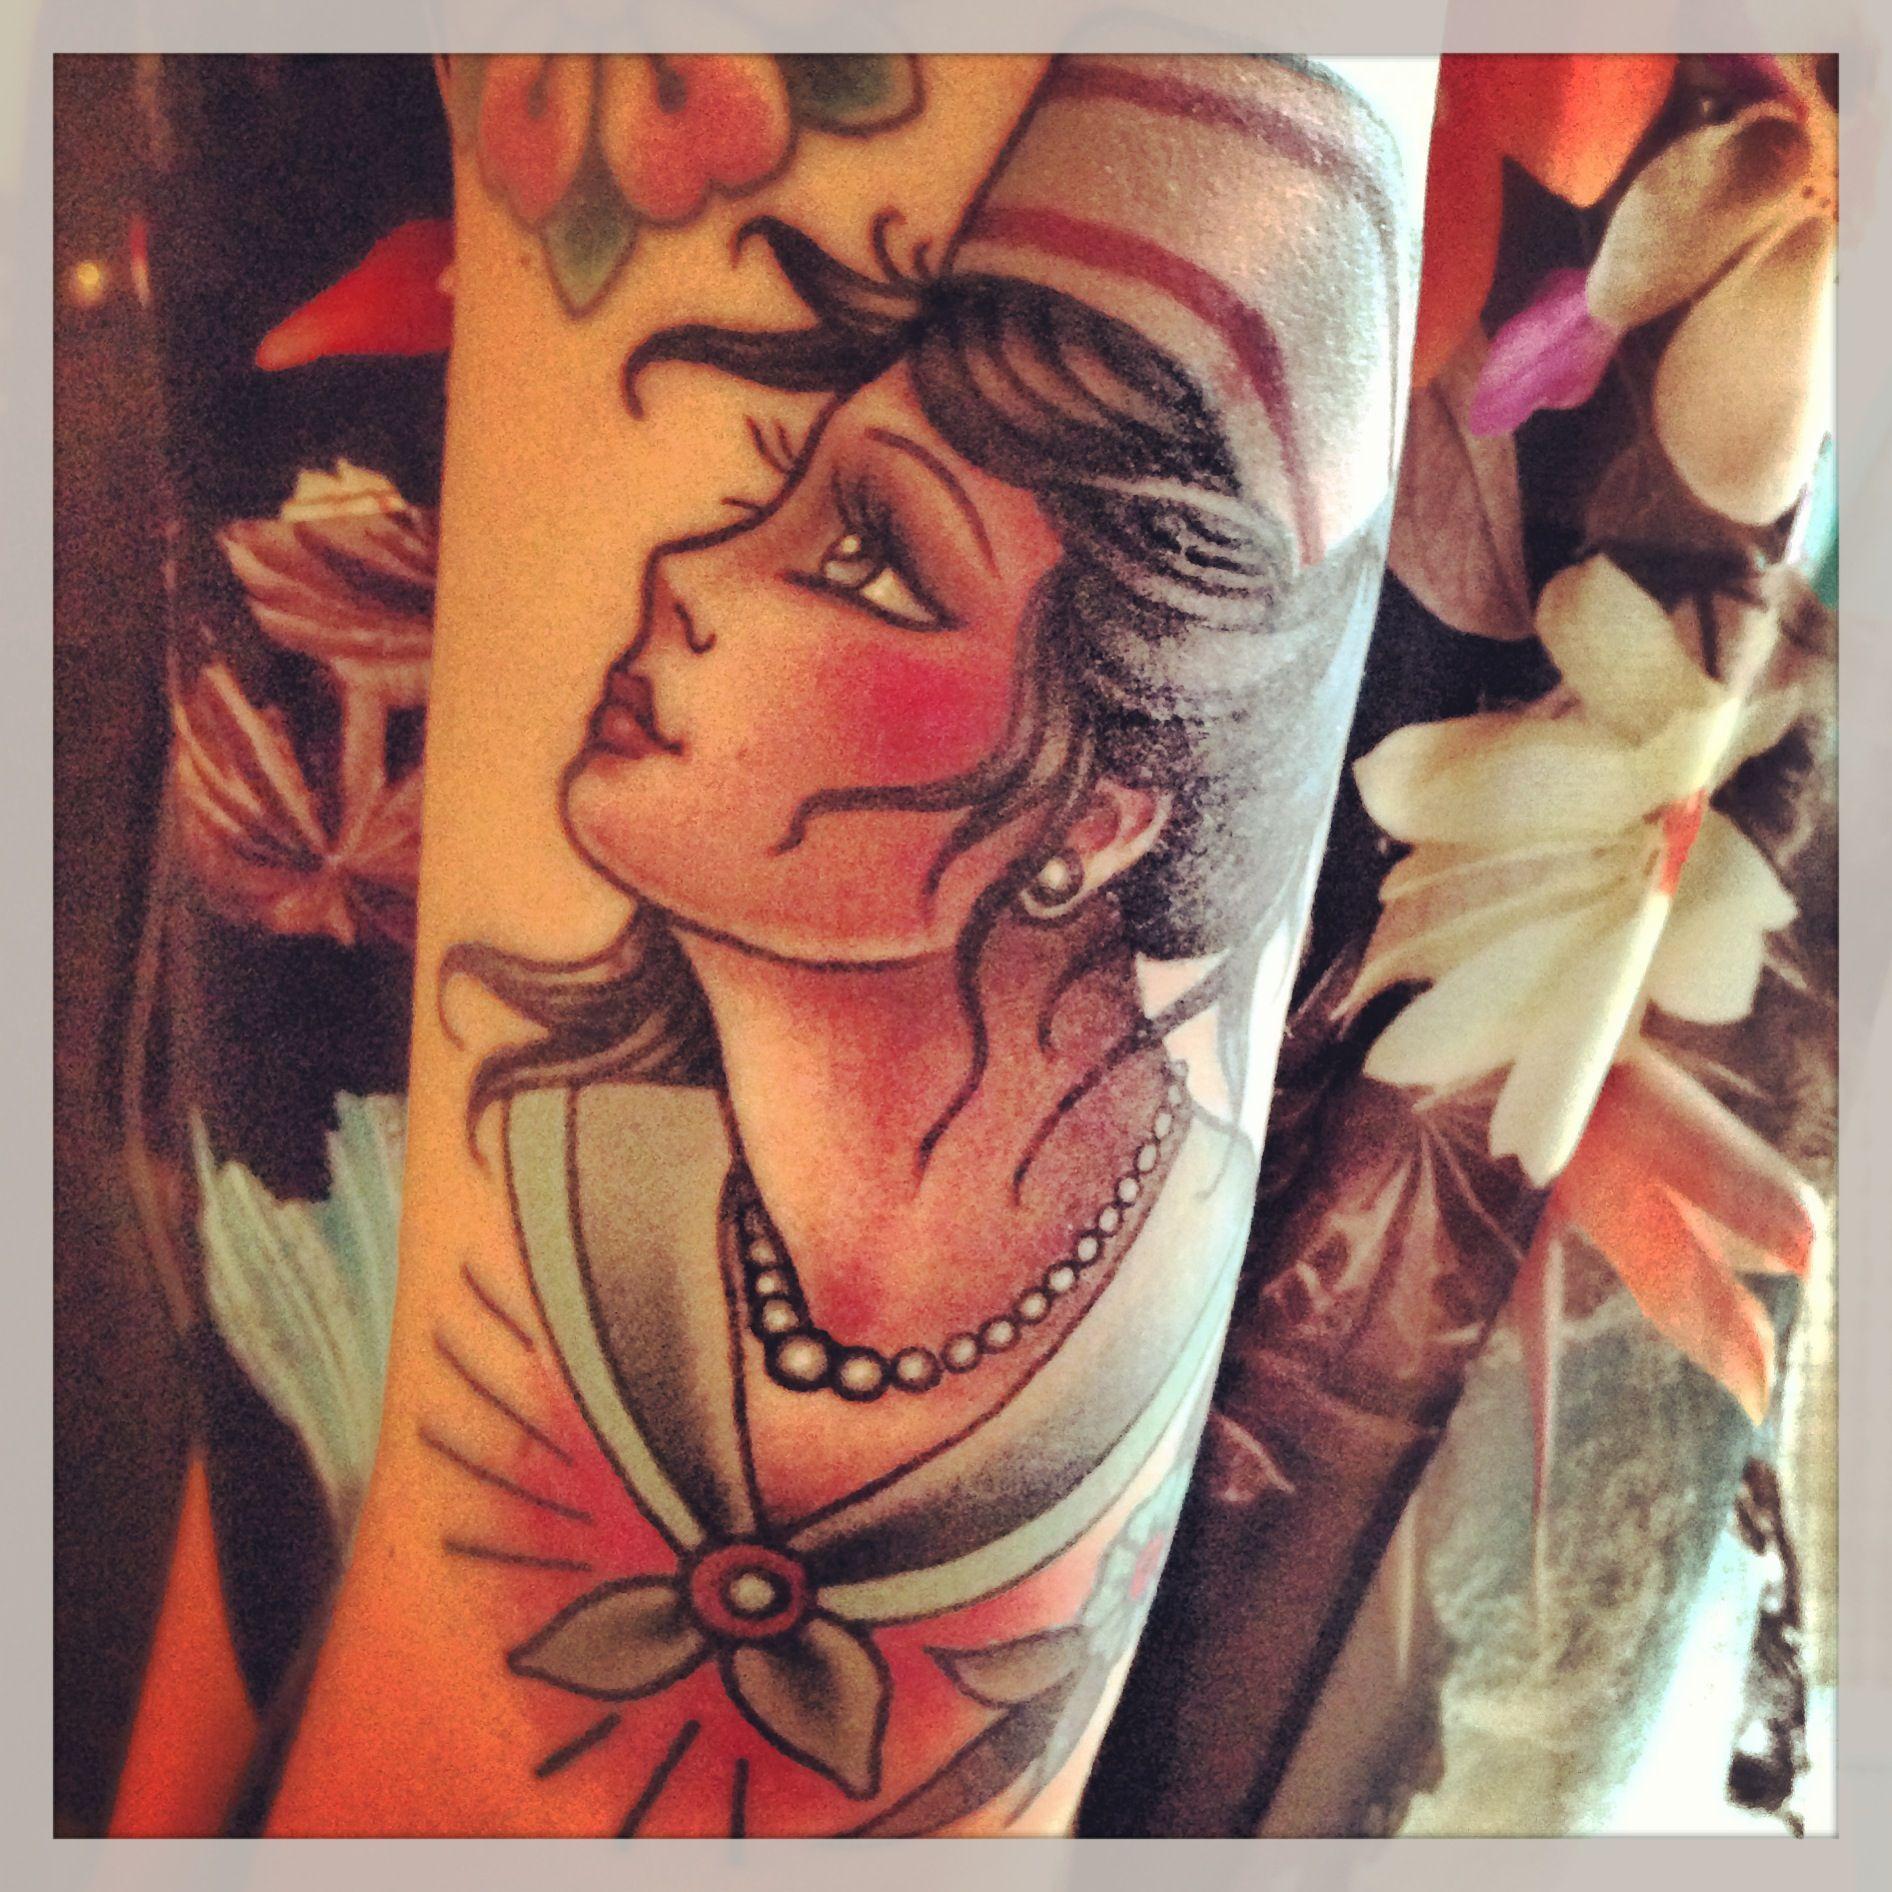 Tattoo Ideas Nurse: Nurse Tattoo By WT Norbert